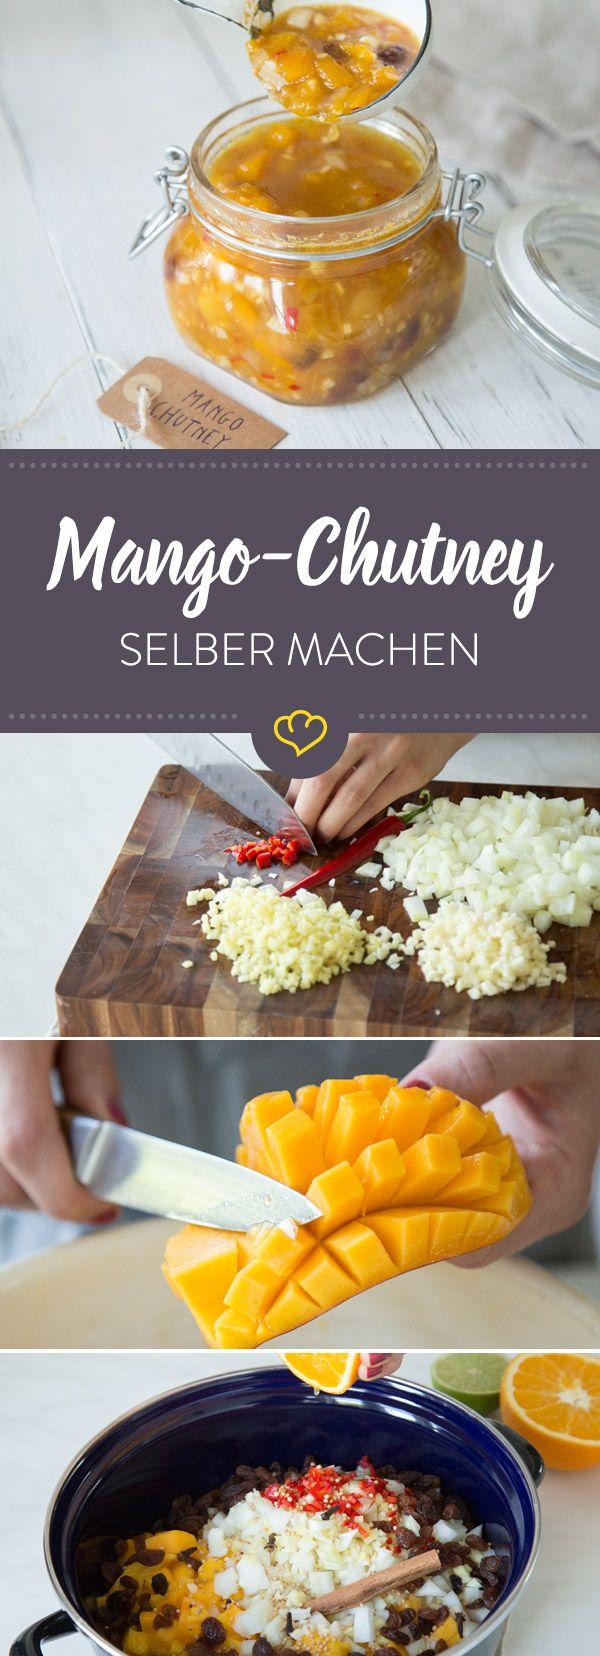 Traditionelles Mango-Chutney #tomatocreamsauces